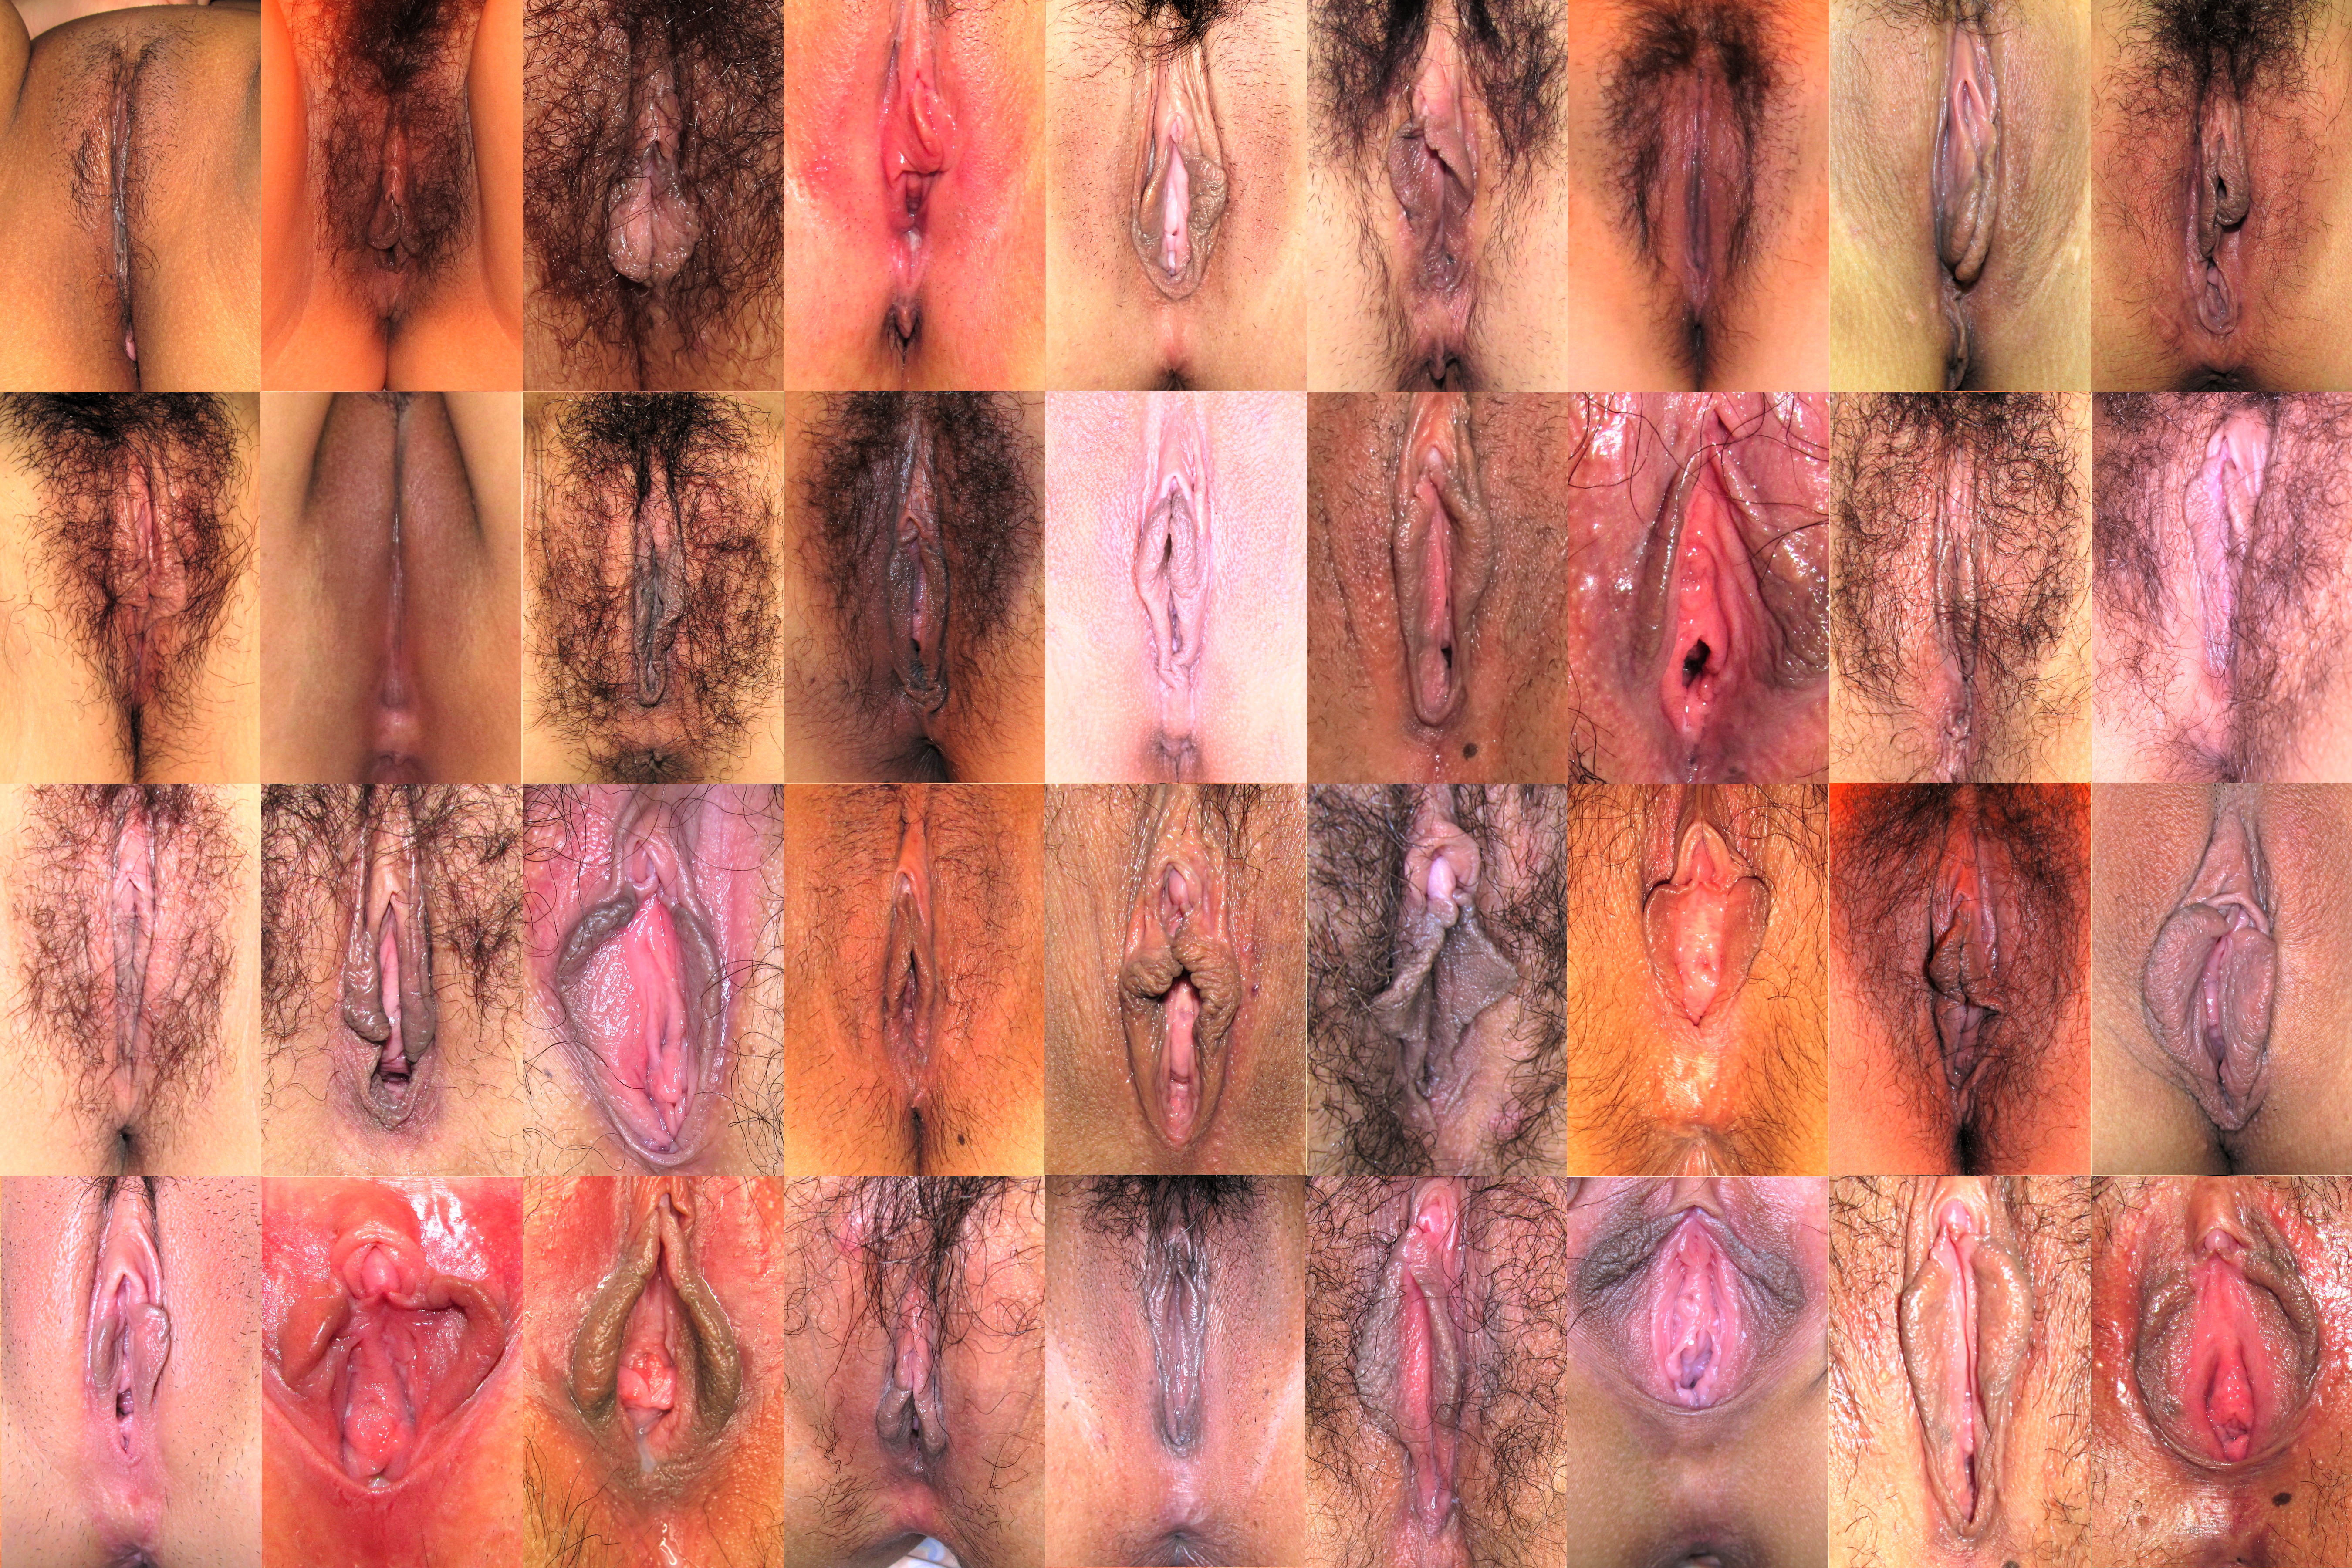 [Bild: Vagina_collage_16.jpg]